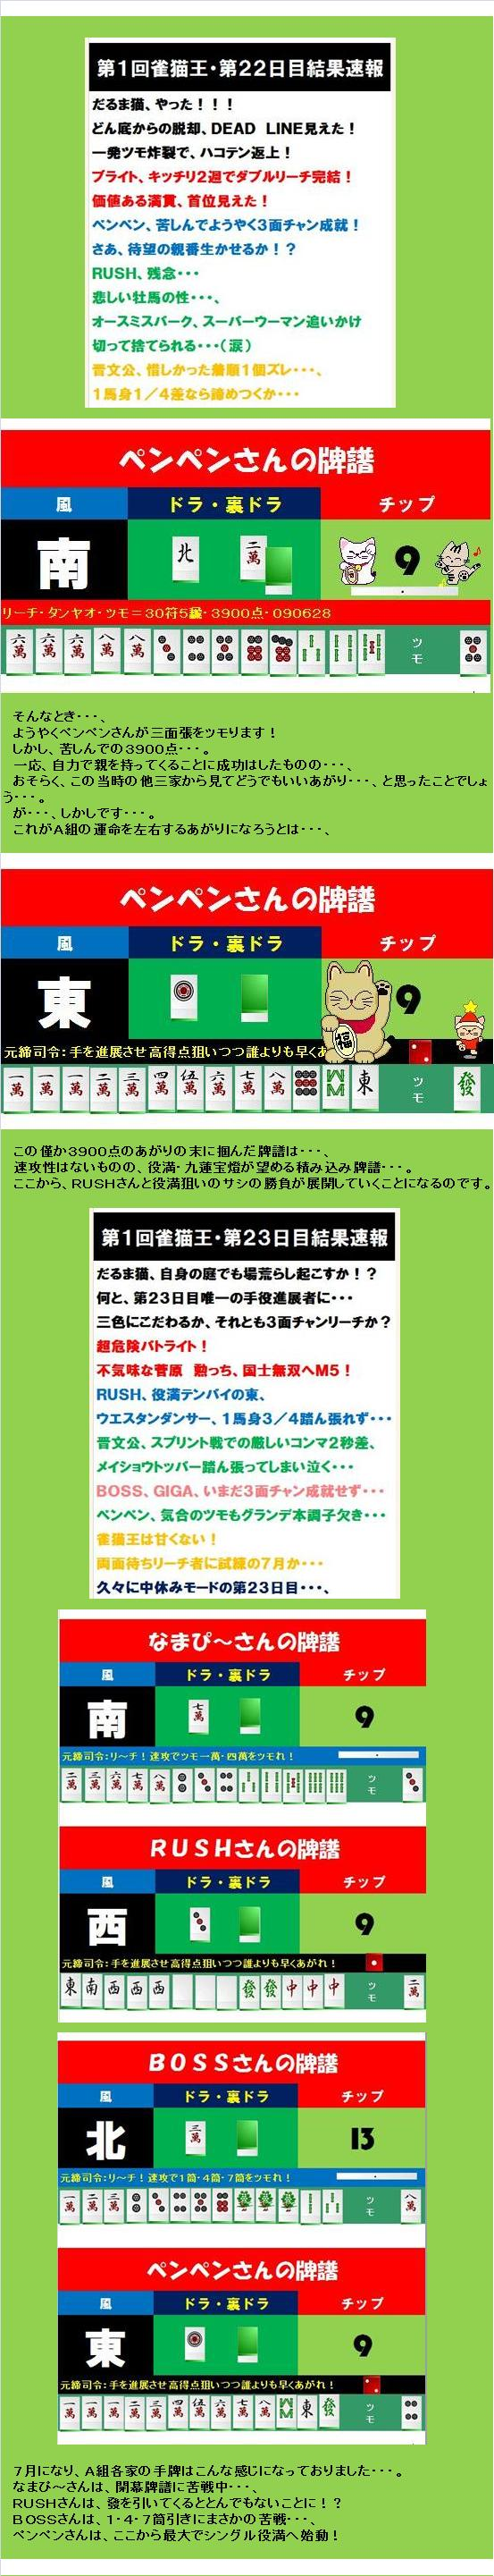 20100226・A組回顧11.jpg